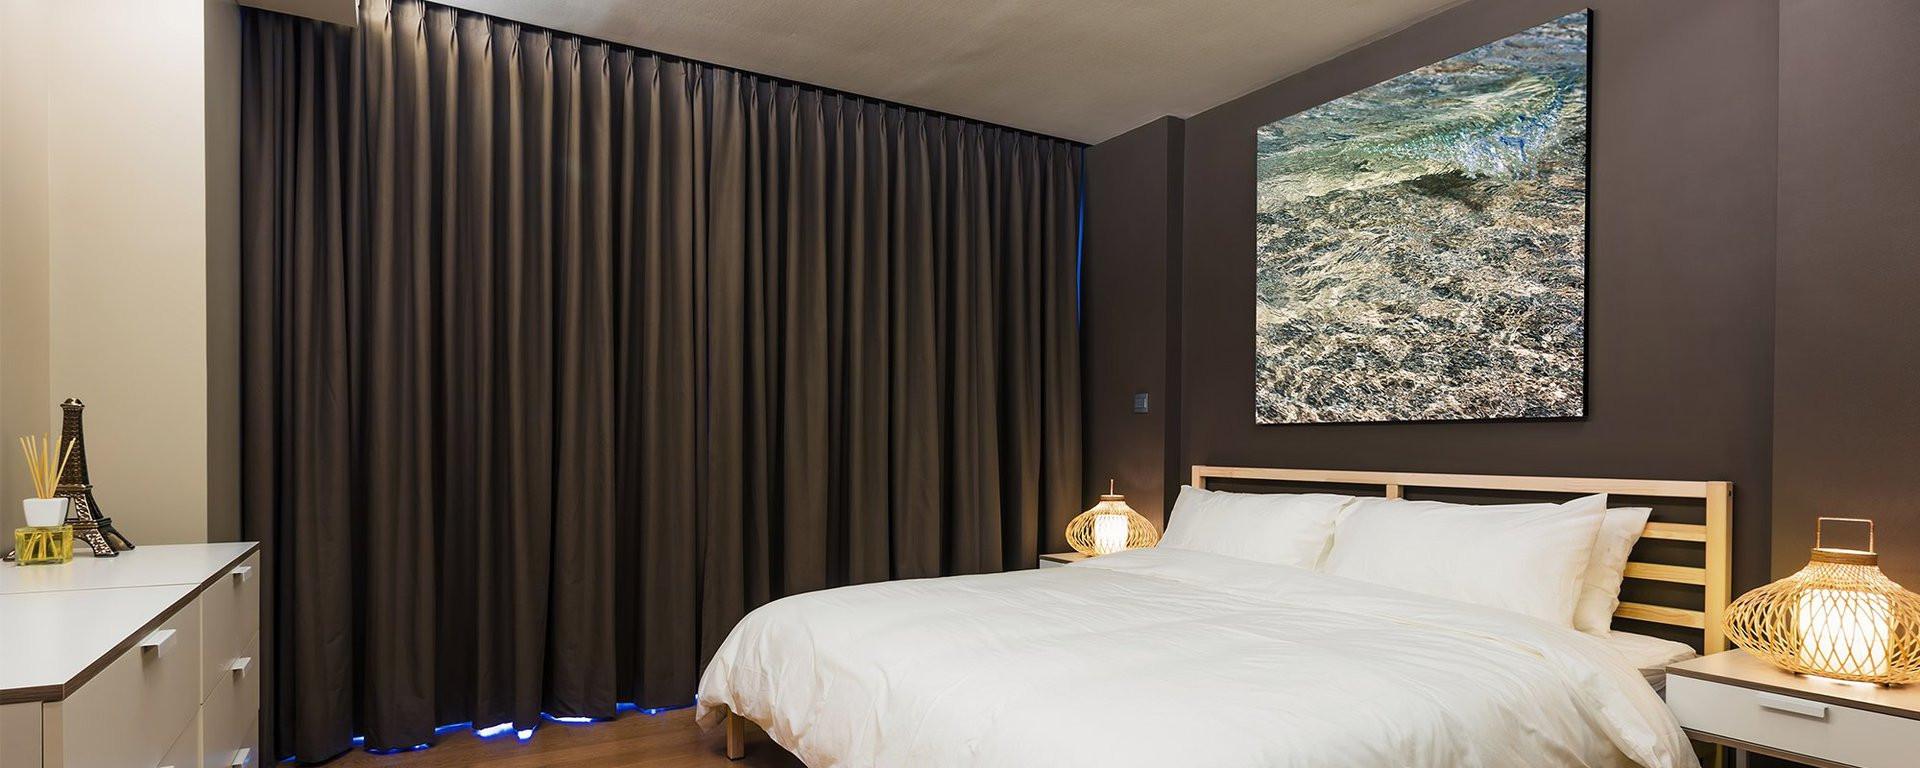 bedroom - Curtain villa .jpeg